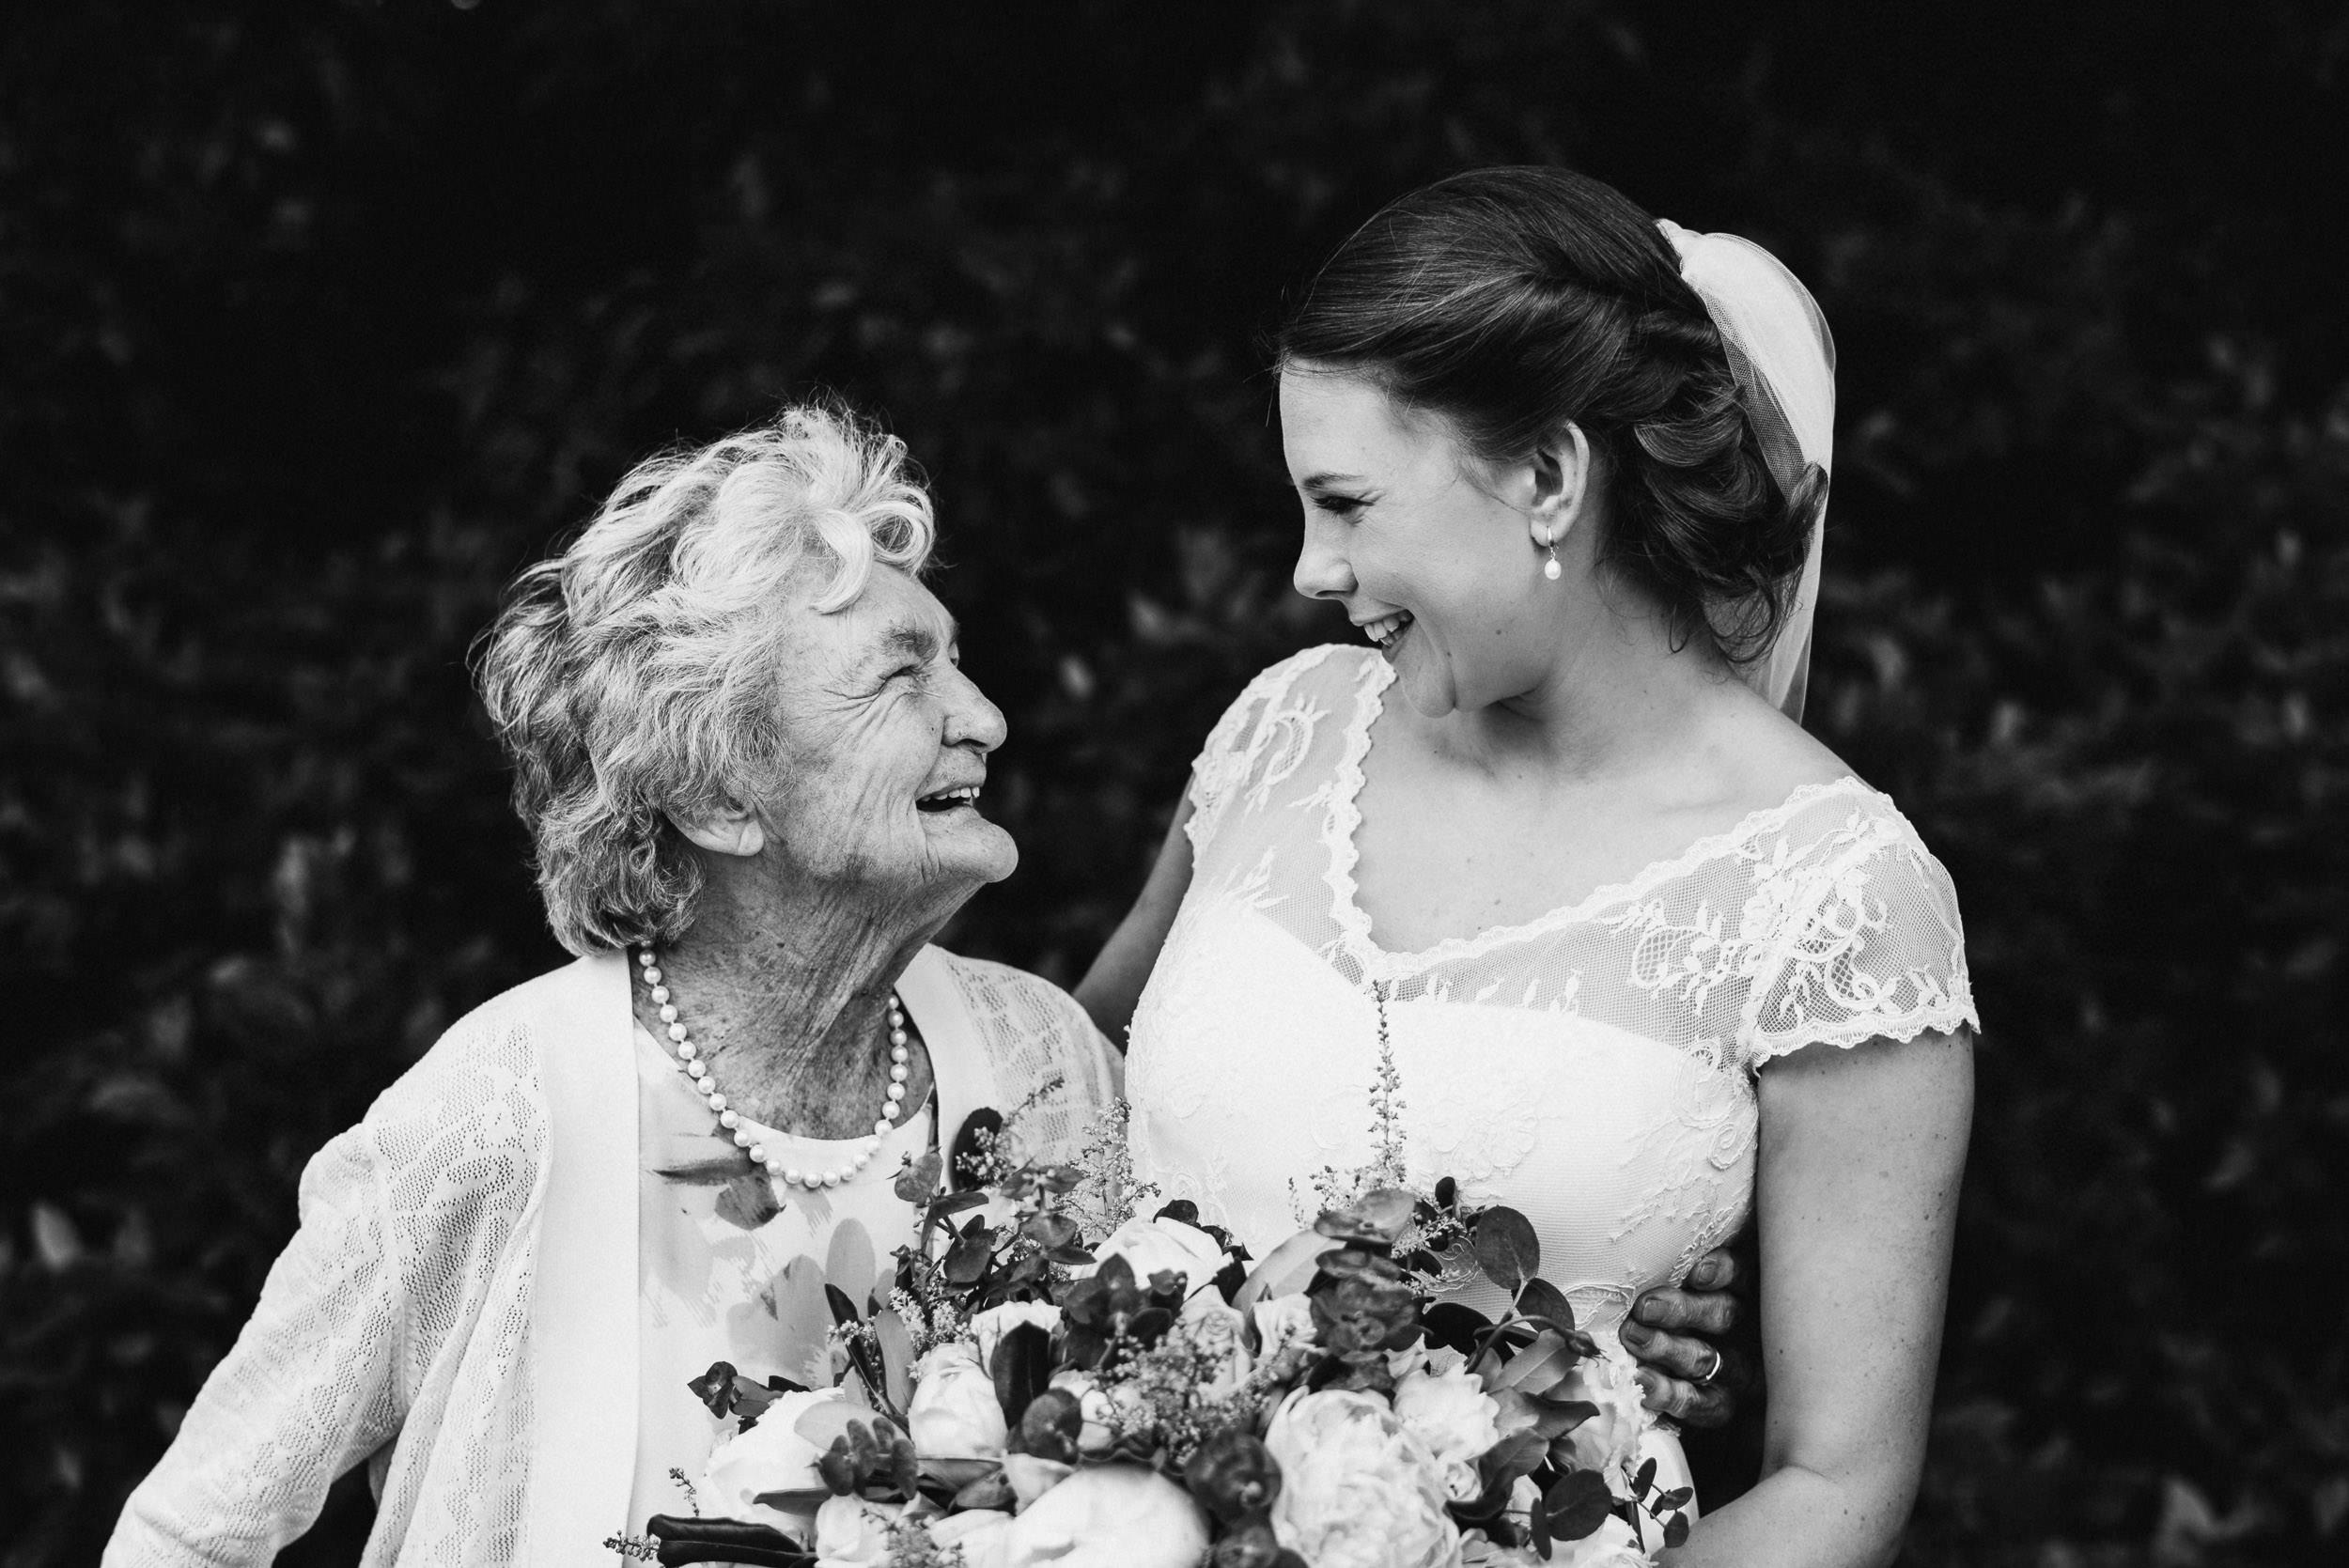 wedding-photography-christchurch312-2.jpg